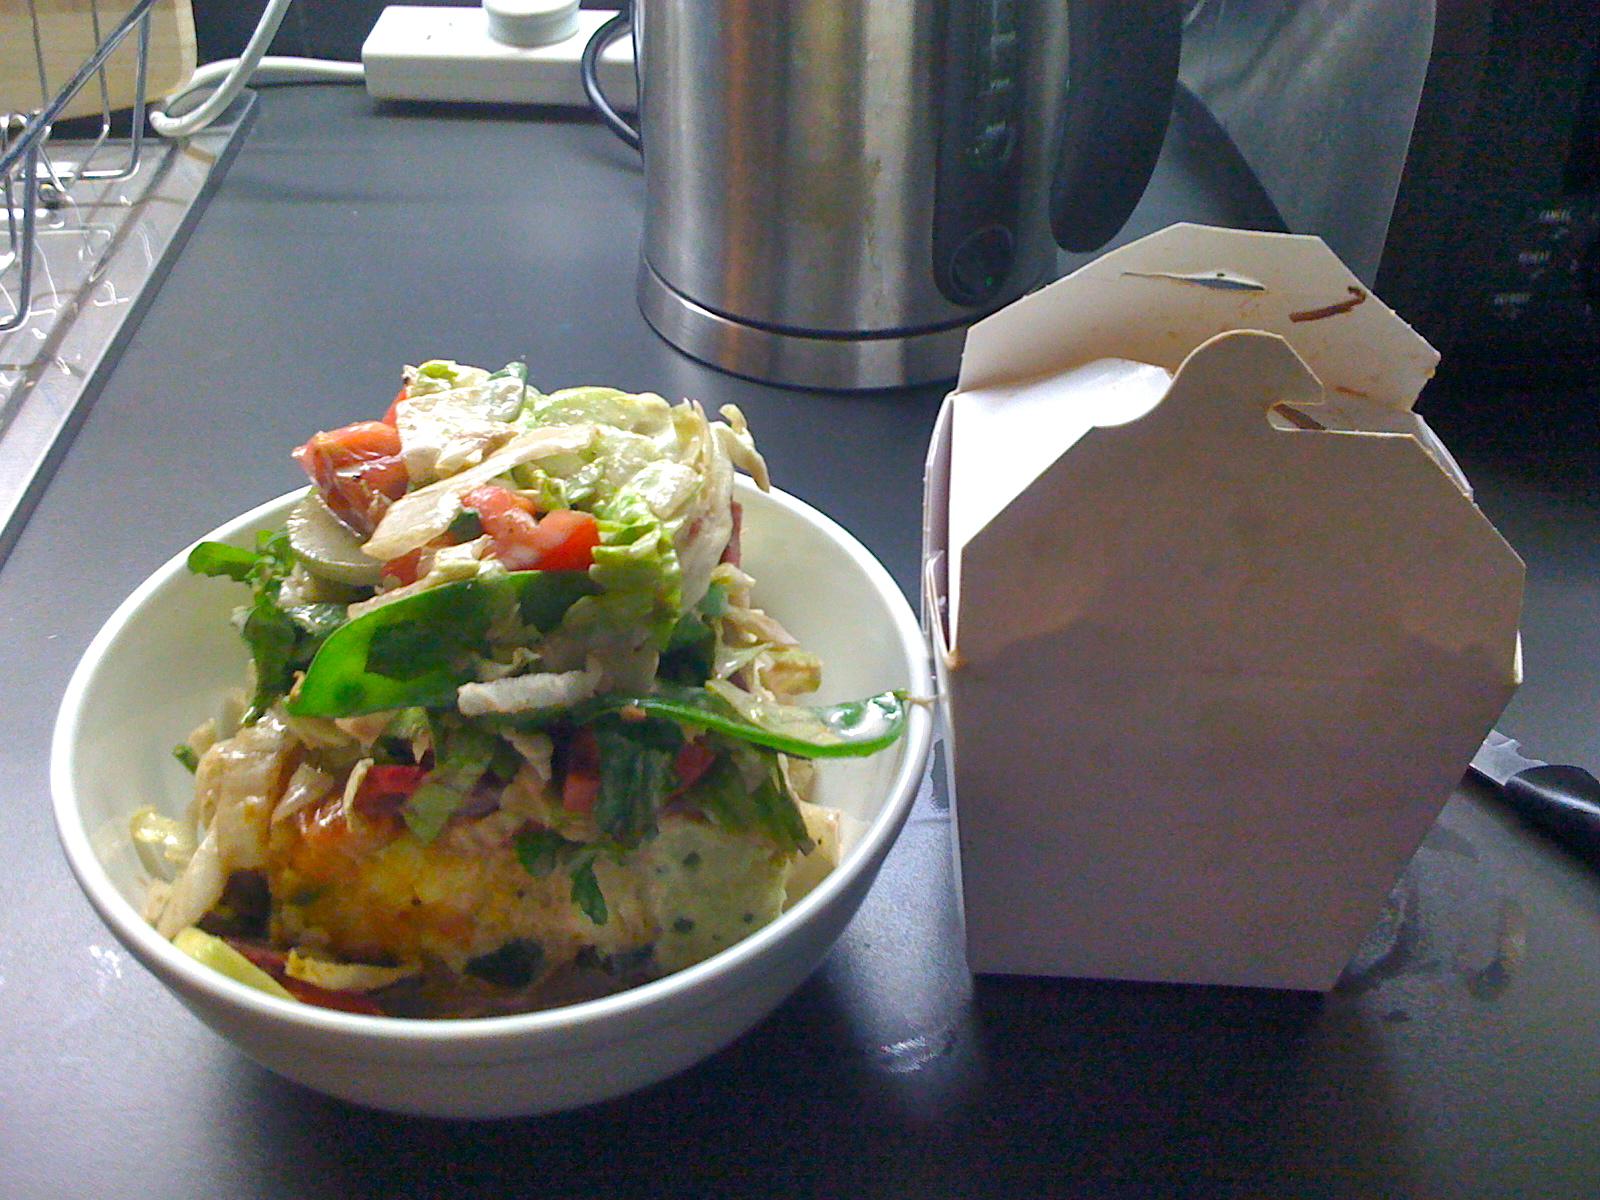 Malibu salad with smoked chicken: a recipe with photos 60